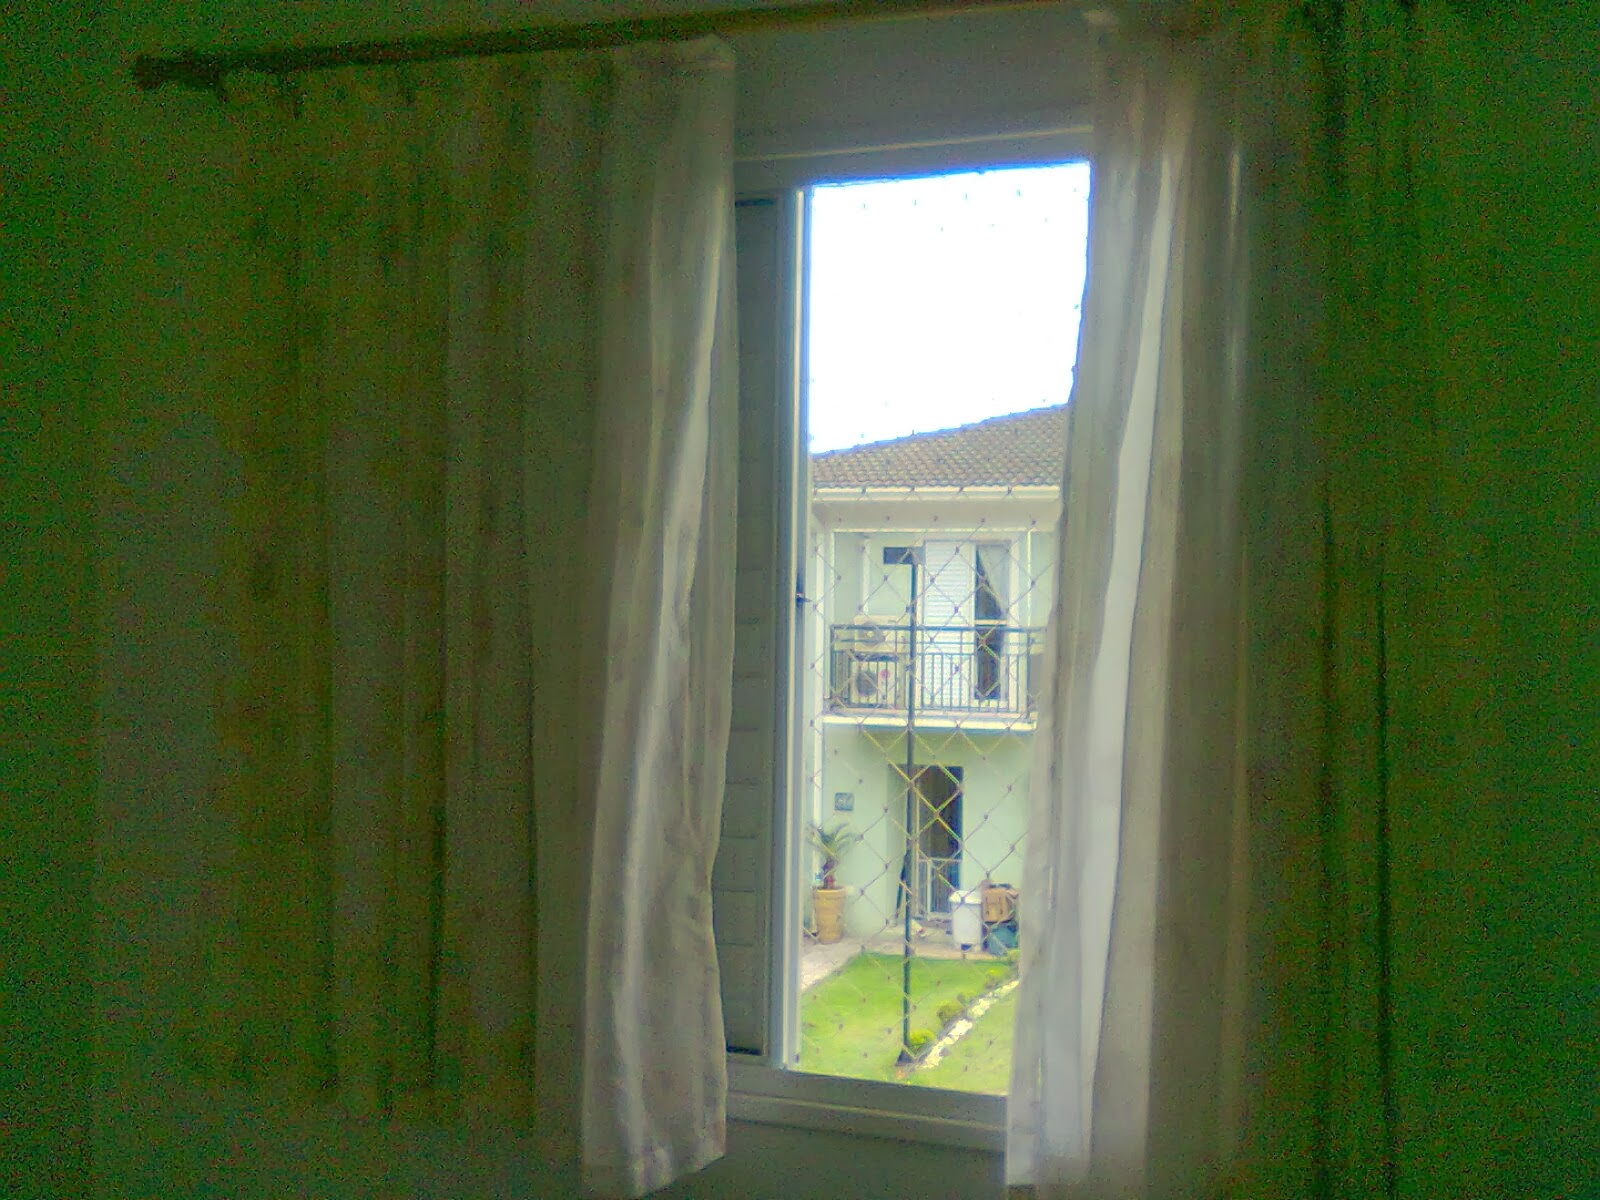 #2F4615 janela de aluminio  com vidros na cor branca com tela de proteção  1694 Janela De Aluminio Na Cor Branca